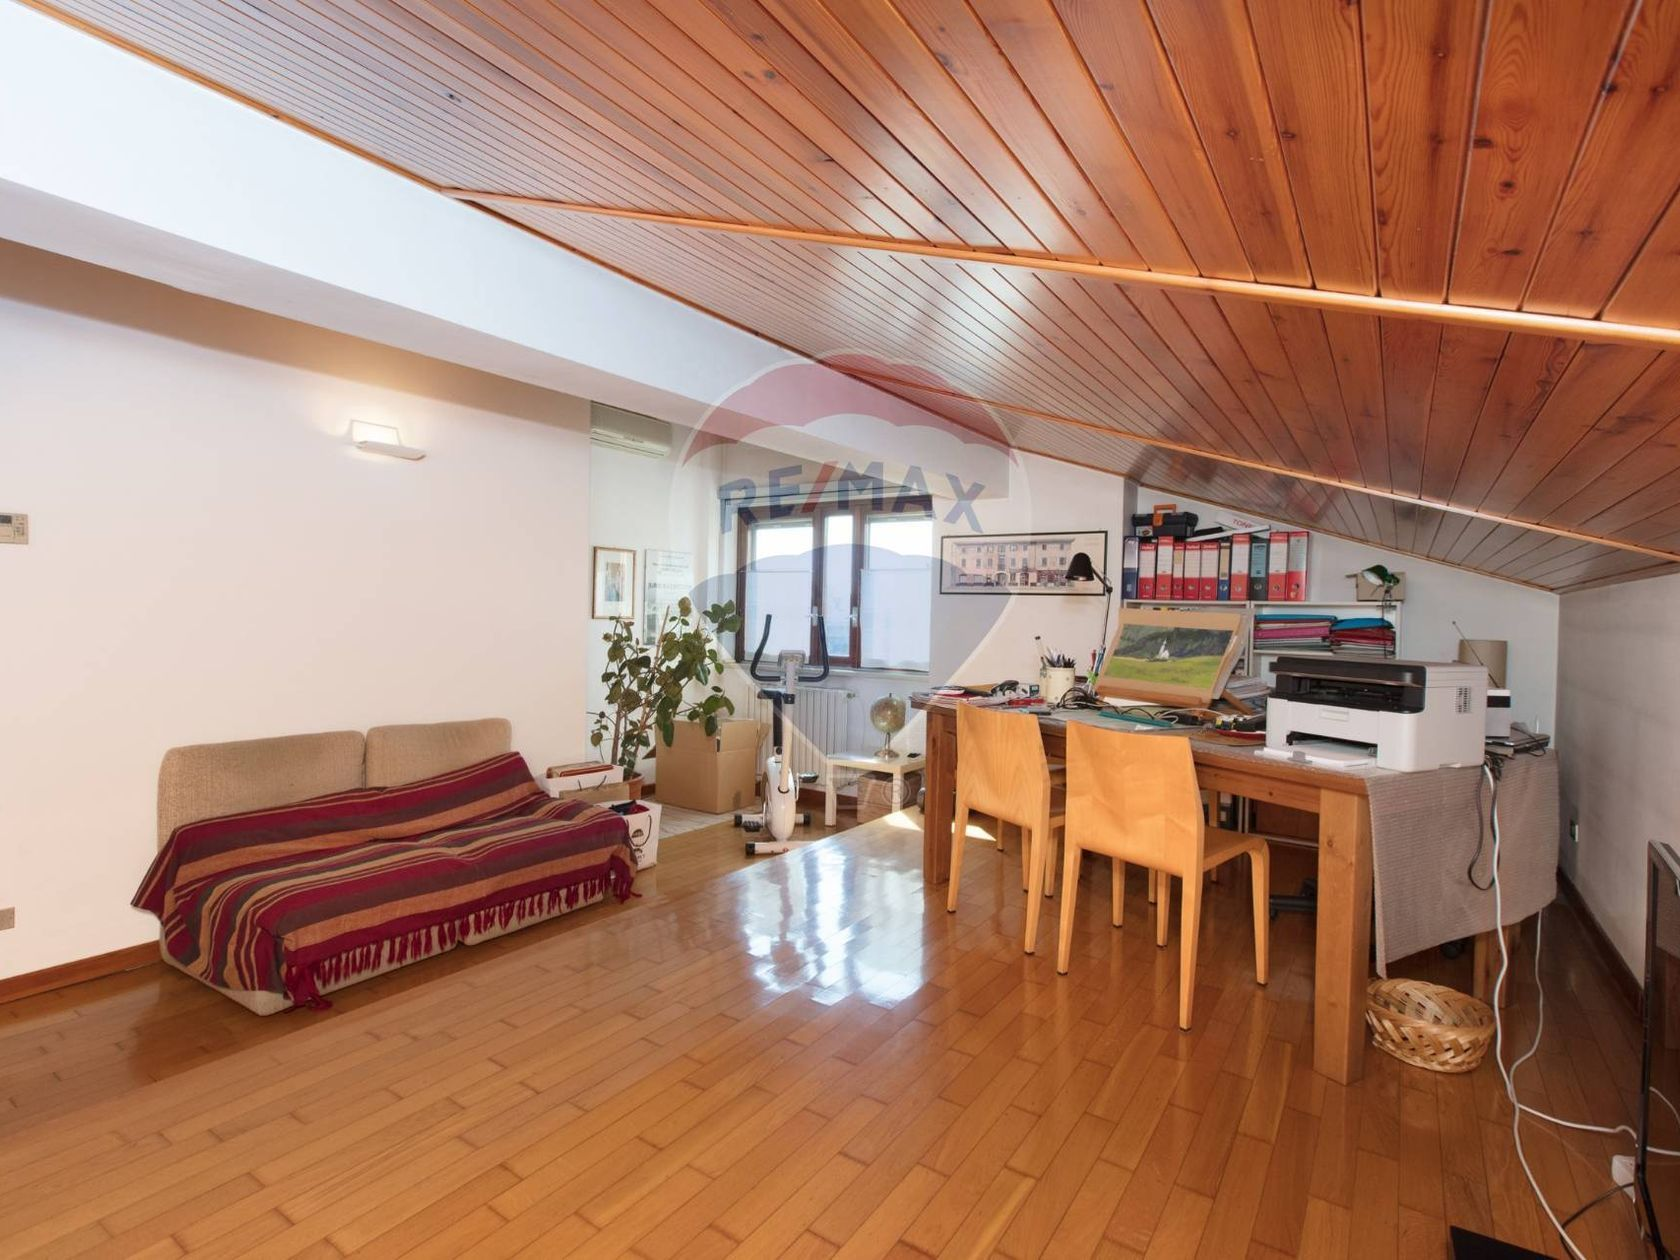 Appartamento Zona Esselunga, Rho, MI Vendita - Foto 18